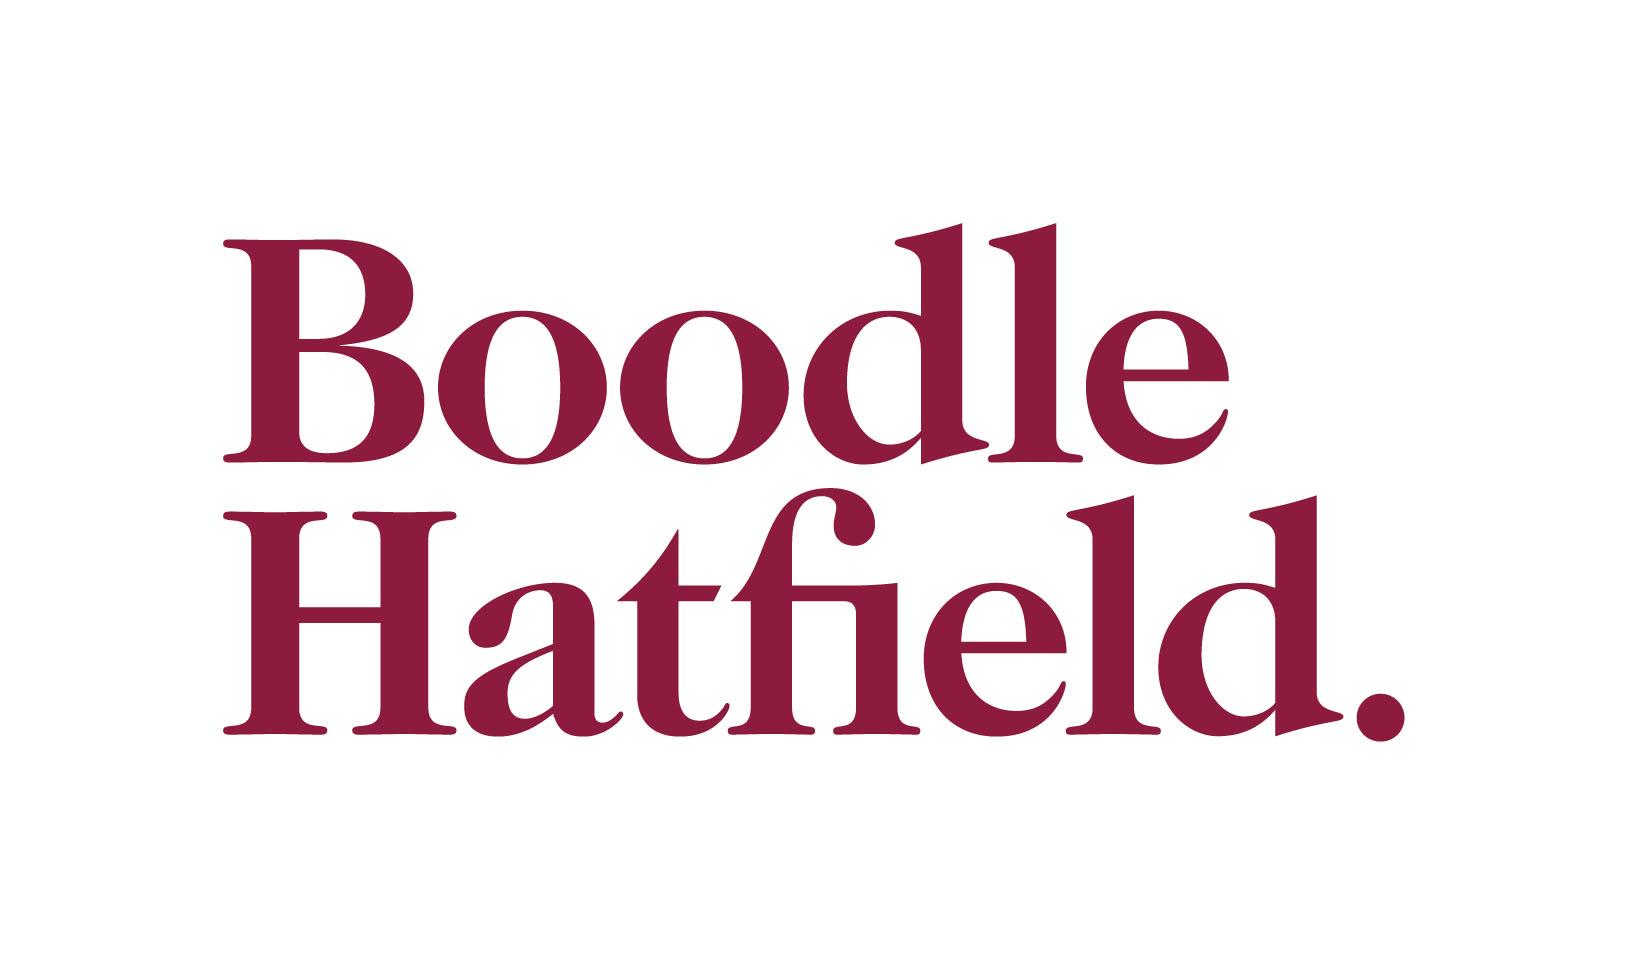 Boodle-Hatfield-logo-colour.jpg